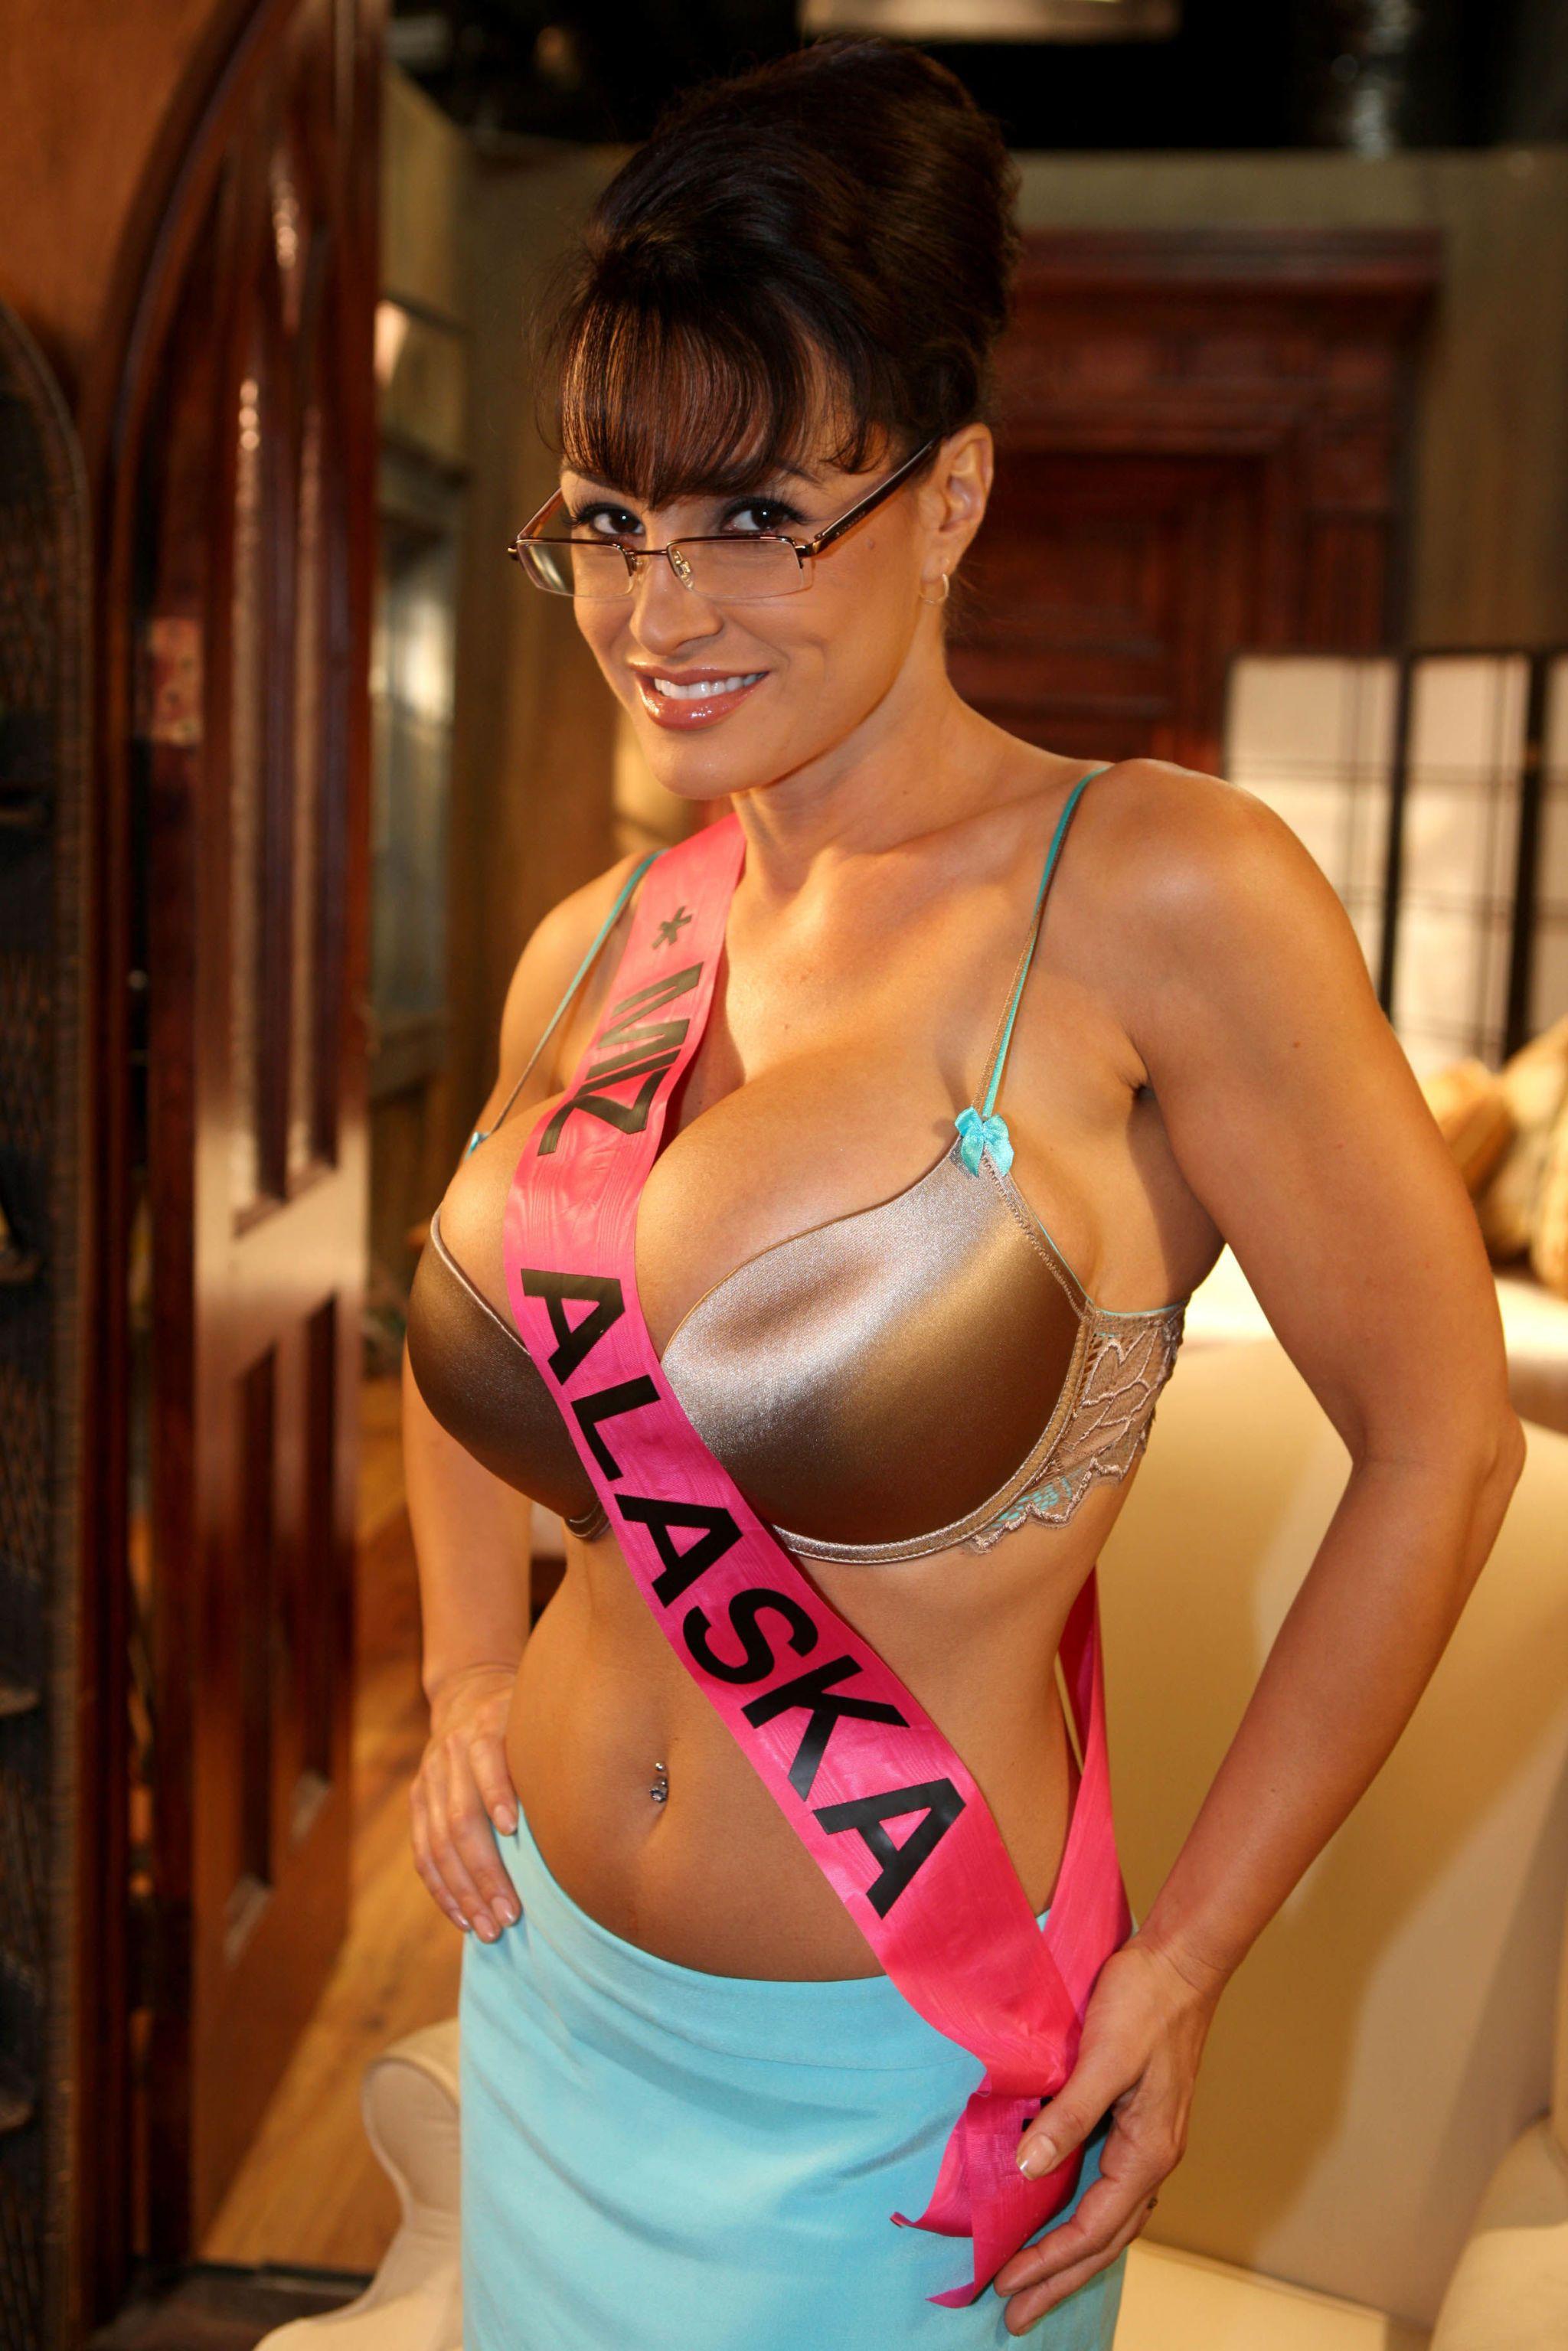 Actriz Porno Lisa Lesbian showing xxx images for lisa ann missionary xxx   www